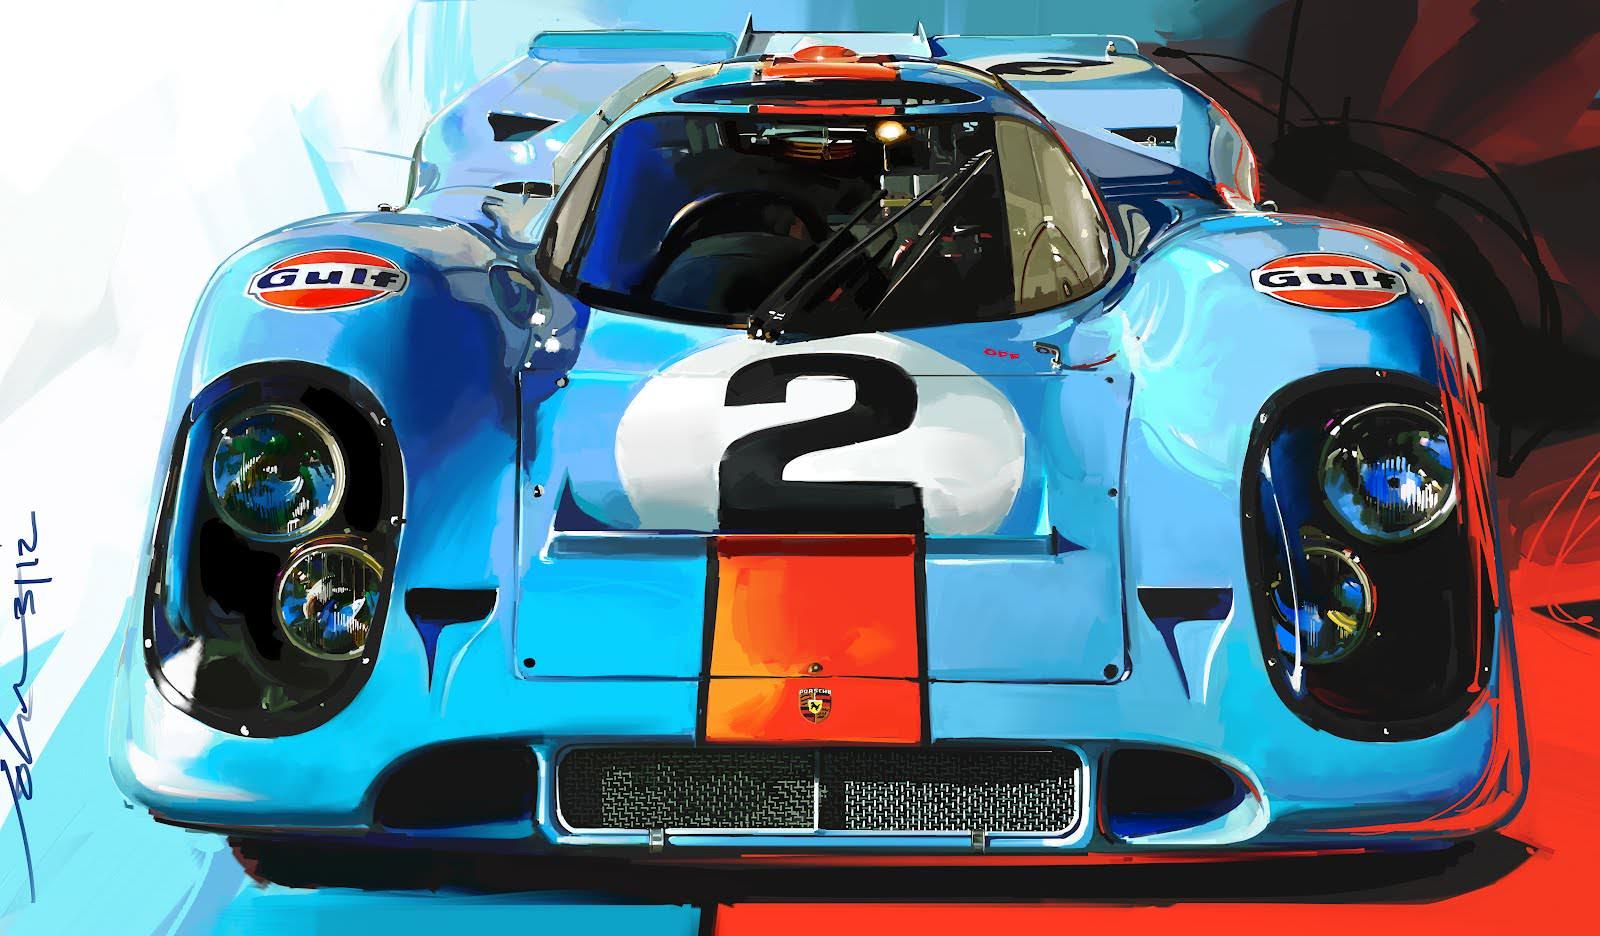 Indy Car Racing Wallpaper Gulf Porsche 917 By John Krsteski